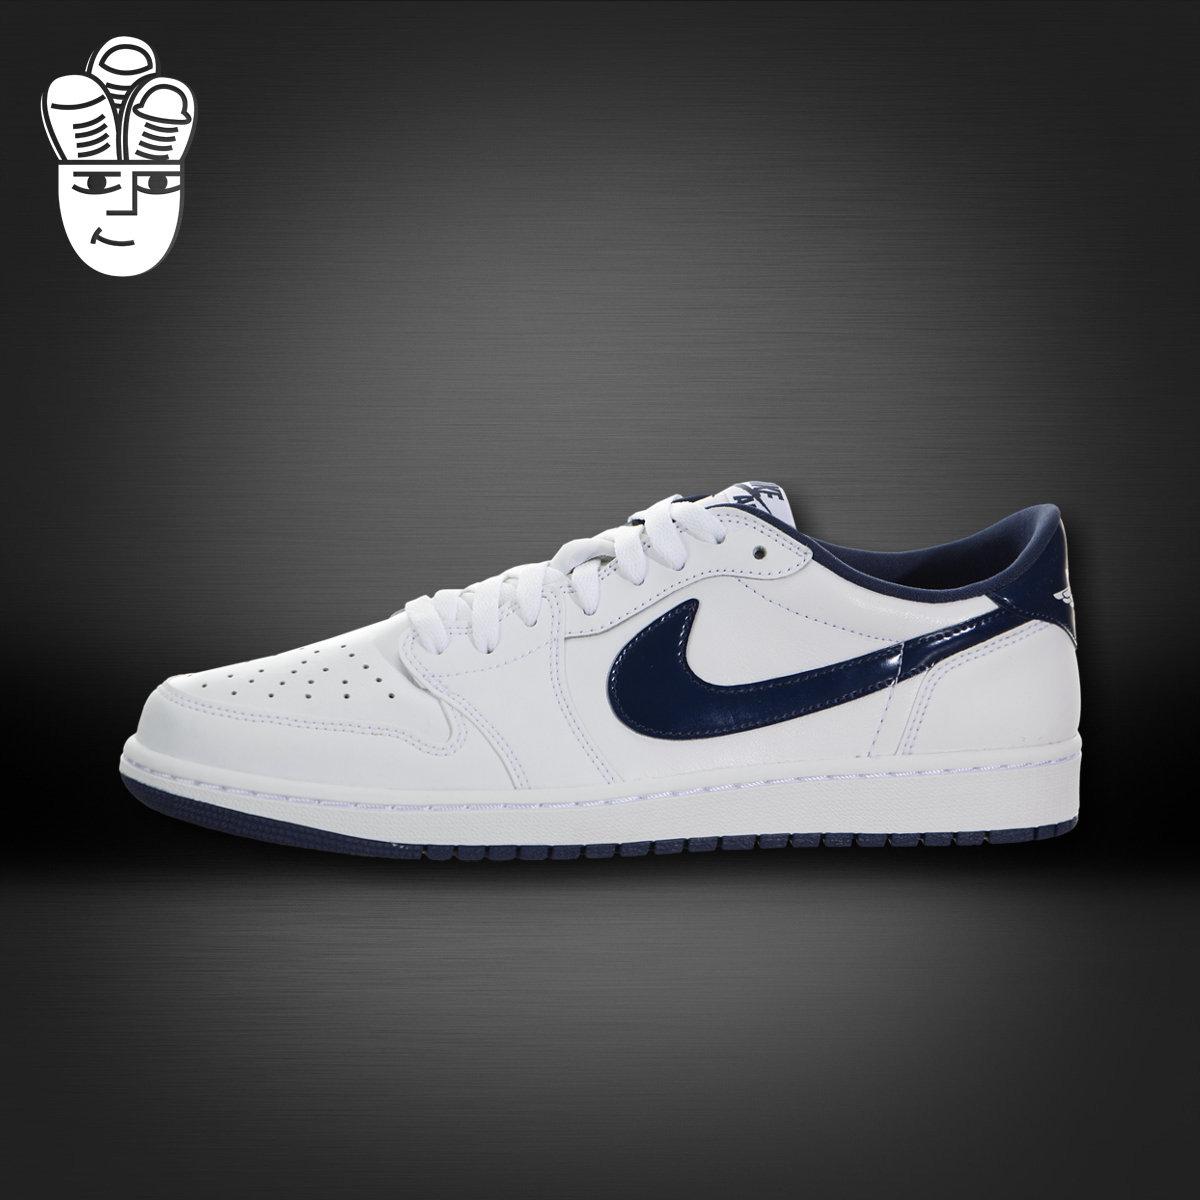 lowest price bd9a4 e5a55 ... switzerland get quotations air jordan 1 retro og aj1 reign engraved nike  jordan mens shoes to